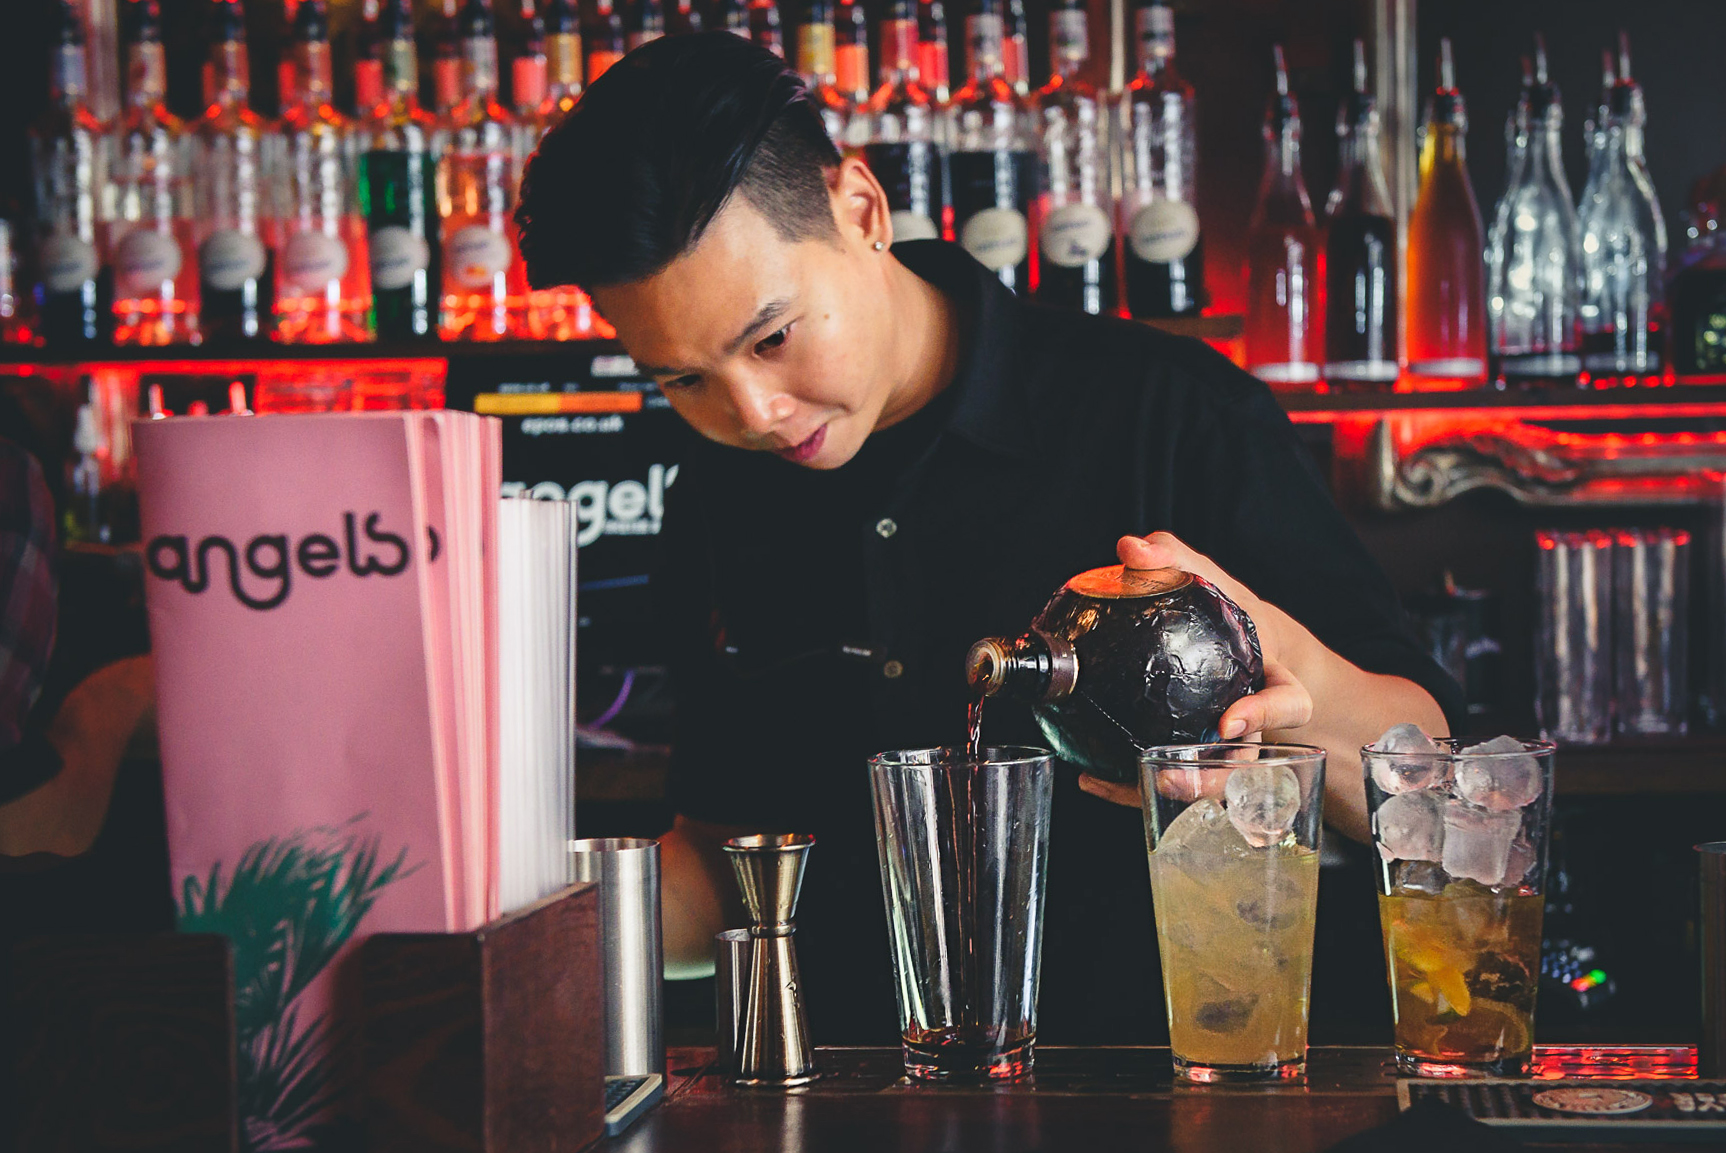 Angels cocktail bar Oxford_24.11.2018_629.jpg